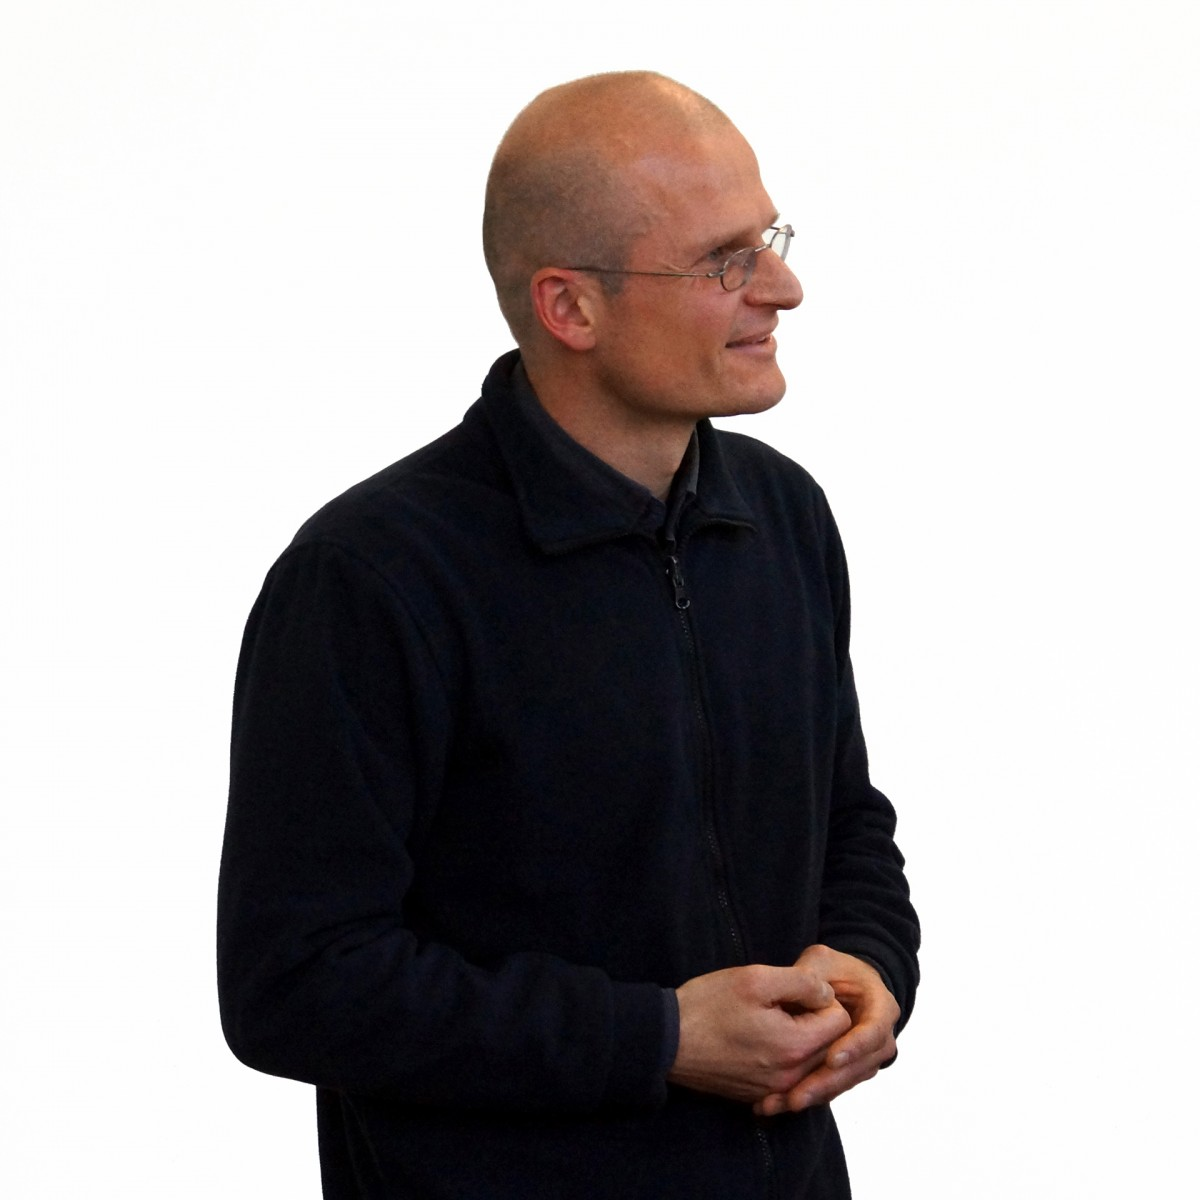 Jürgen Krause (Bild 4): Künstler im Gespräch – Kunsthaus Nürnberg (2015)